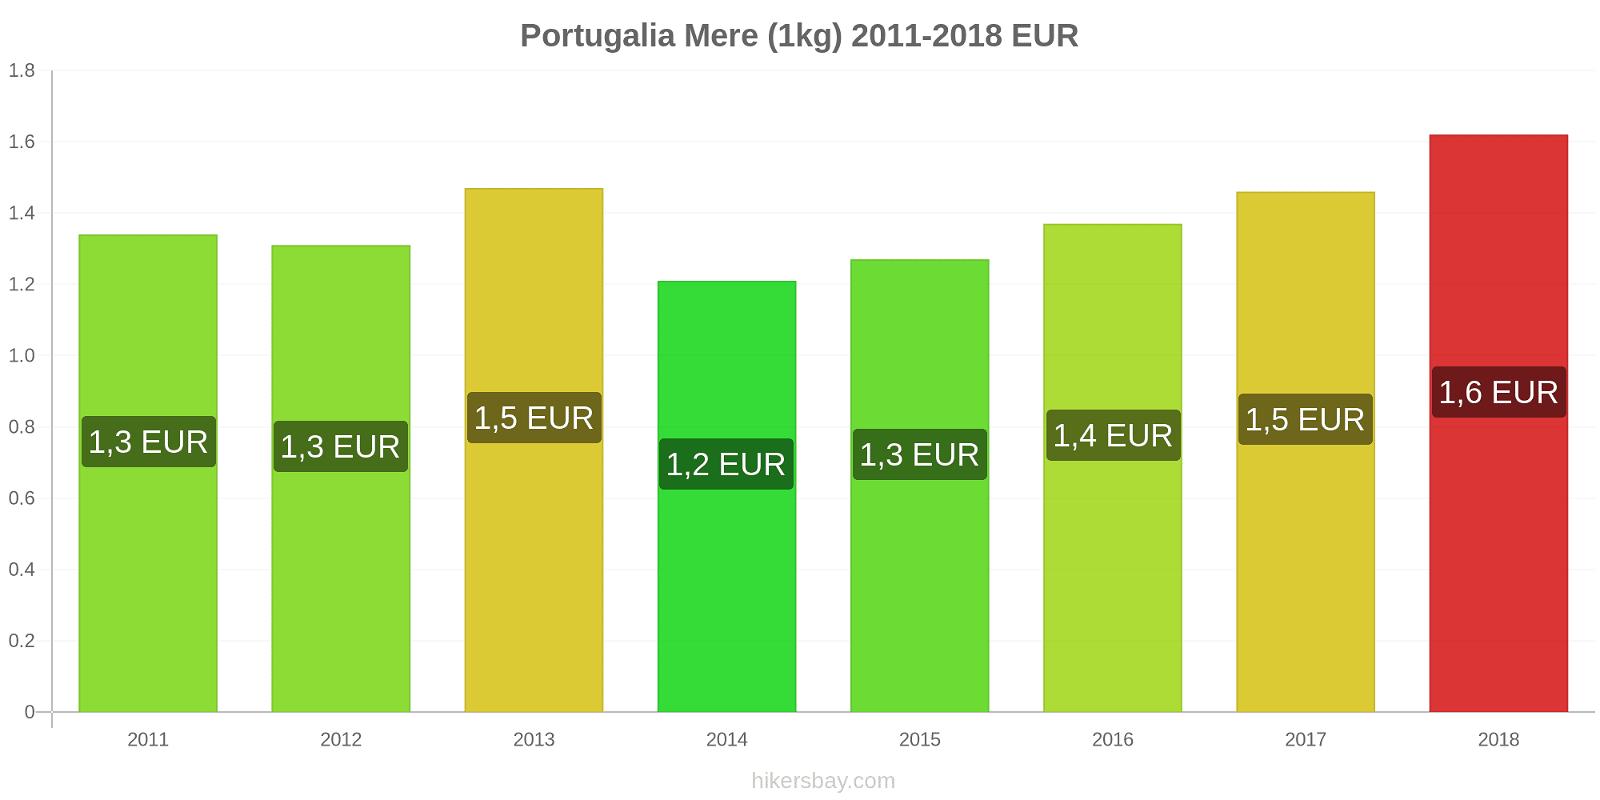 Portugalia modificări de preț Mere (1kg) hikersbay.com